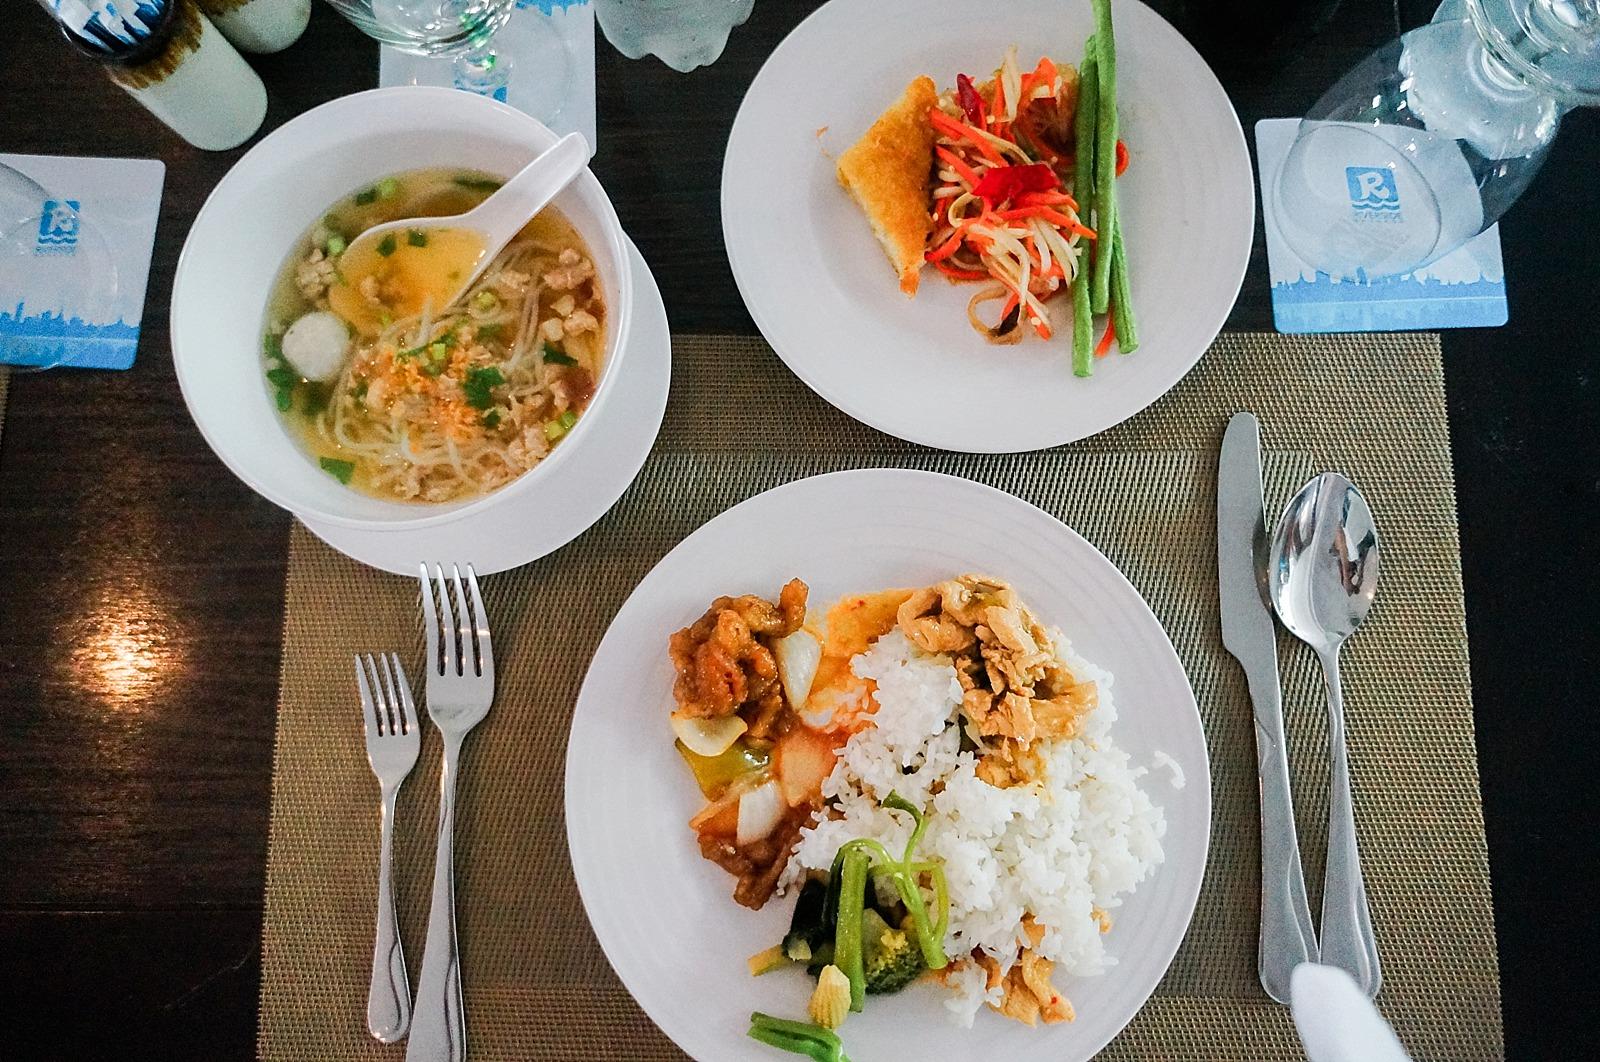 Thailand-diana-elizabeth-travel-blogger-phoenix-204